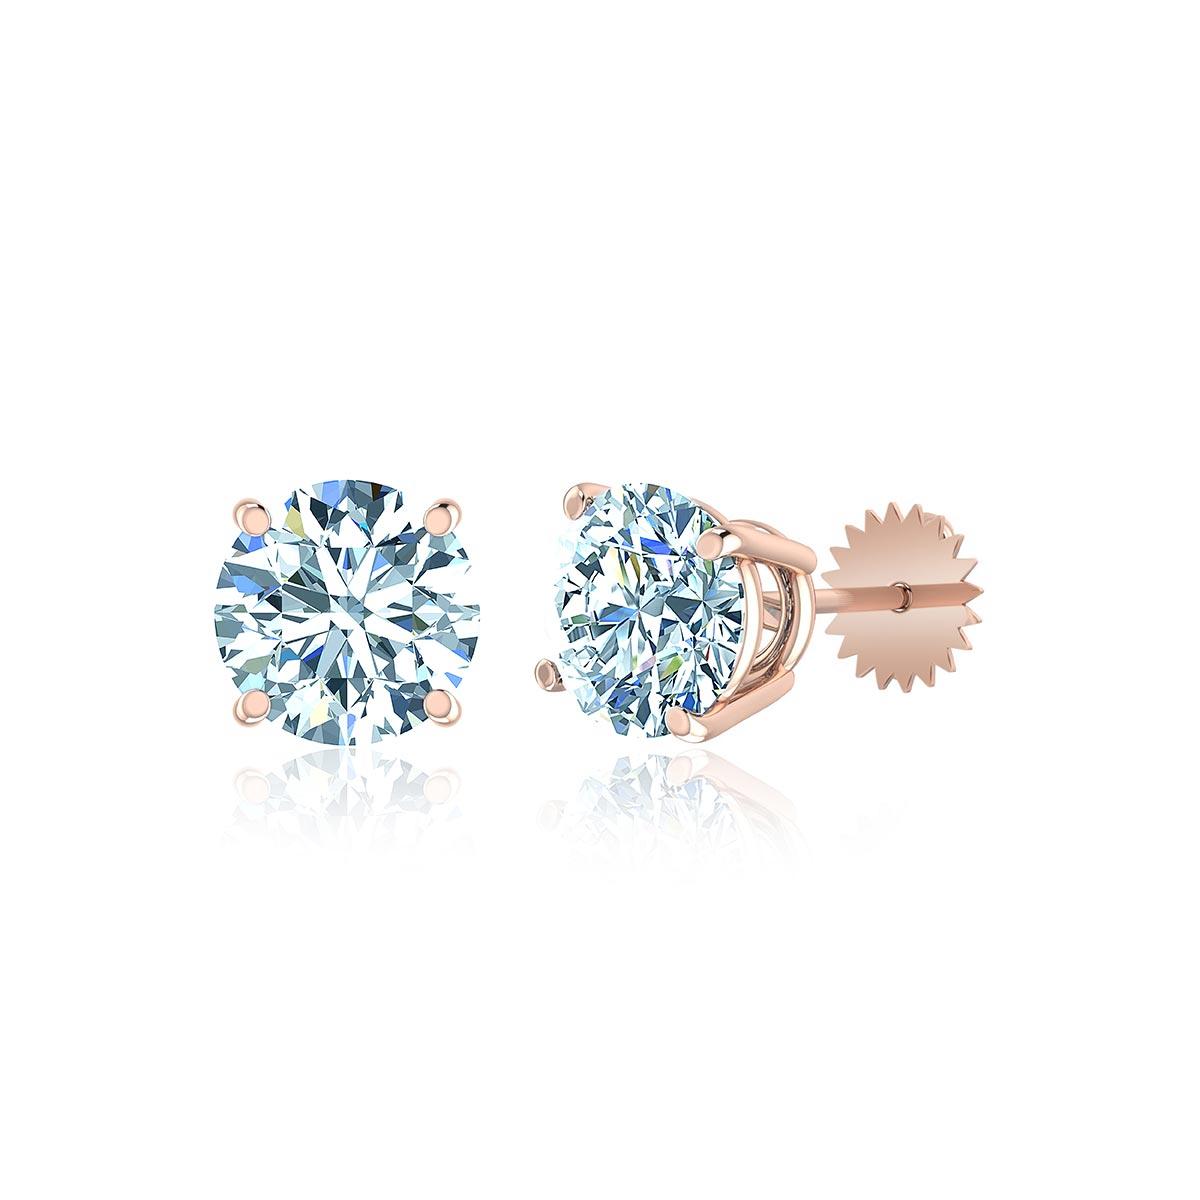 Casa Blanca Diamond Stud Earrings (1/2 CT. TW.)